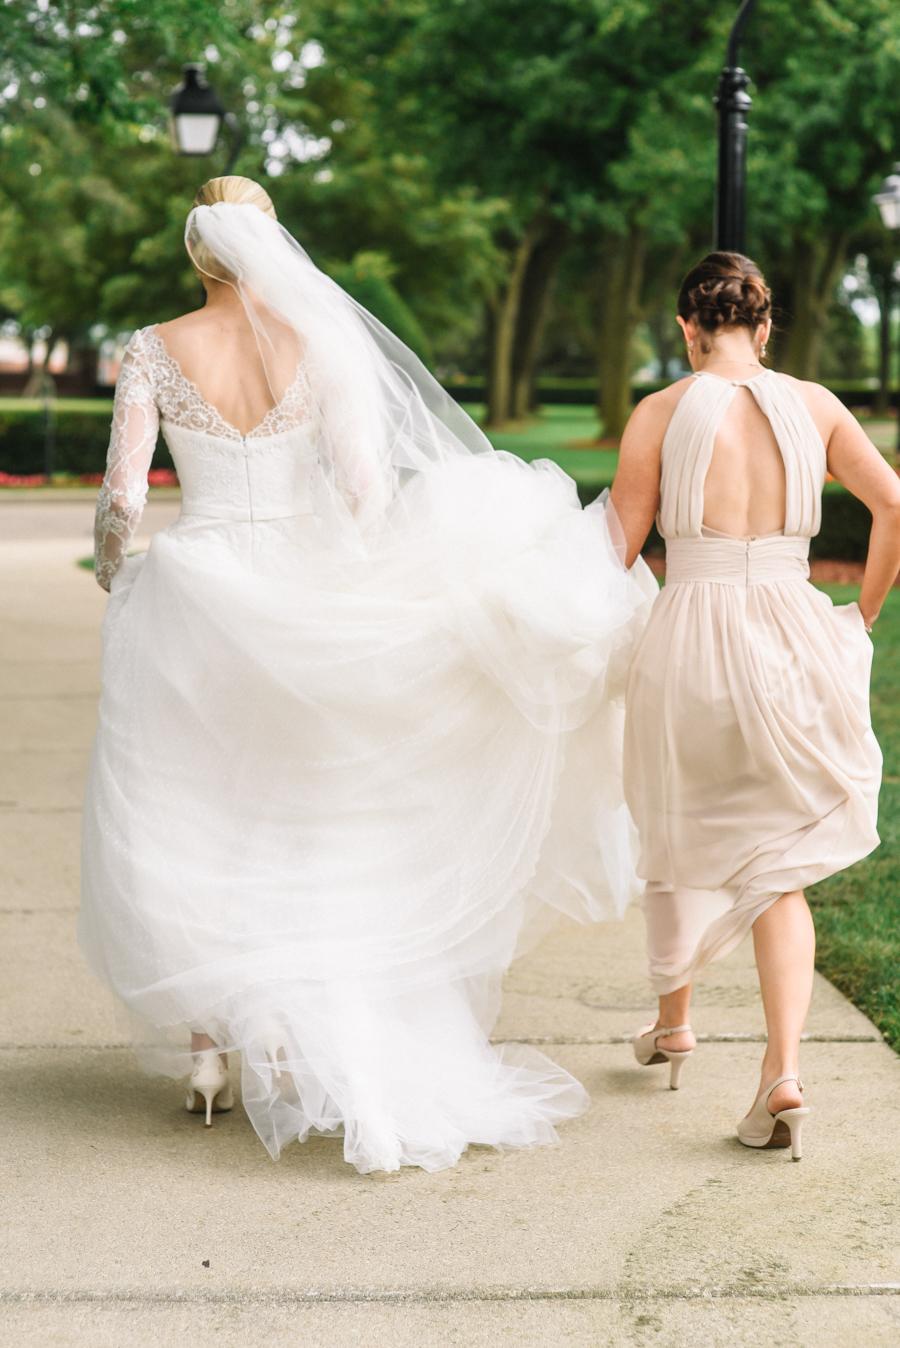 Henry_Ford__Lovett_Hall_Wedding_Detroit-11.jpg